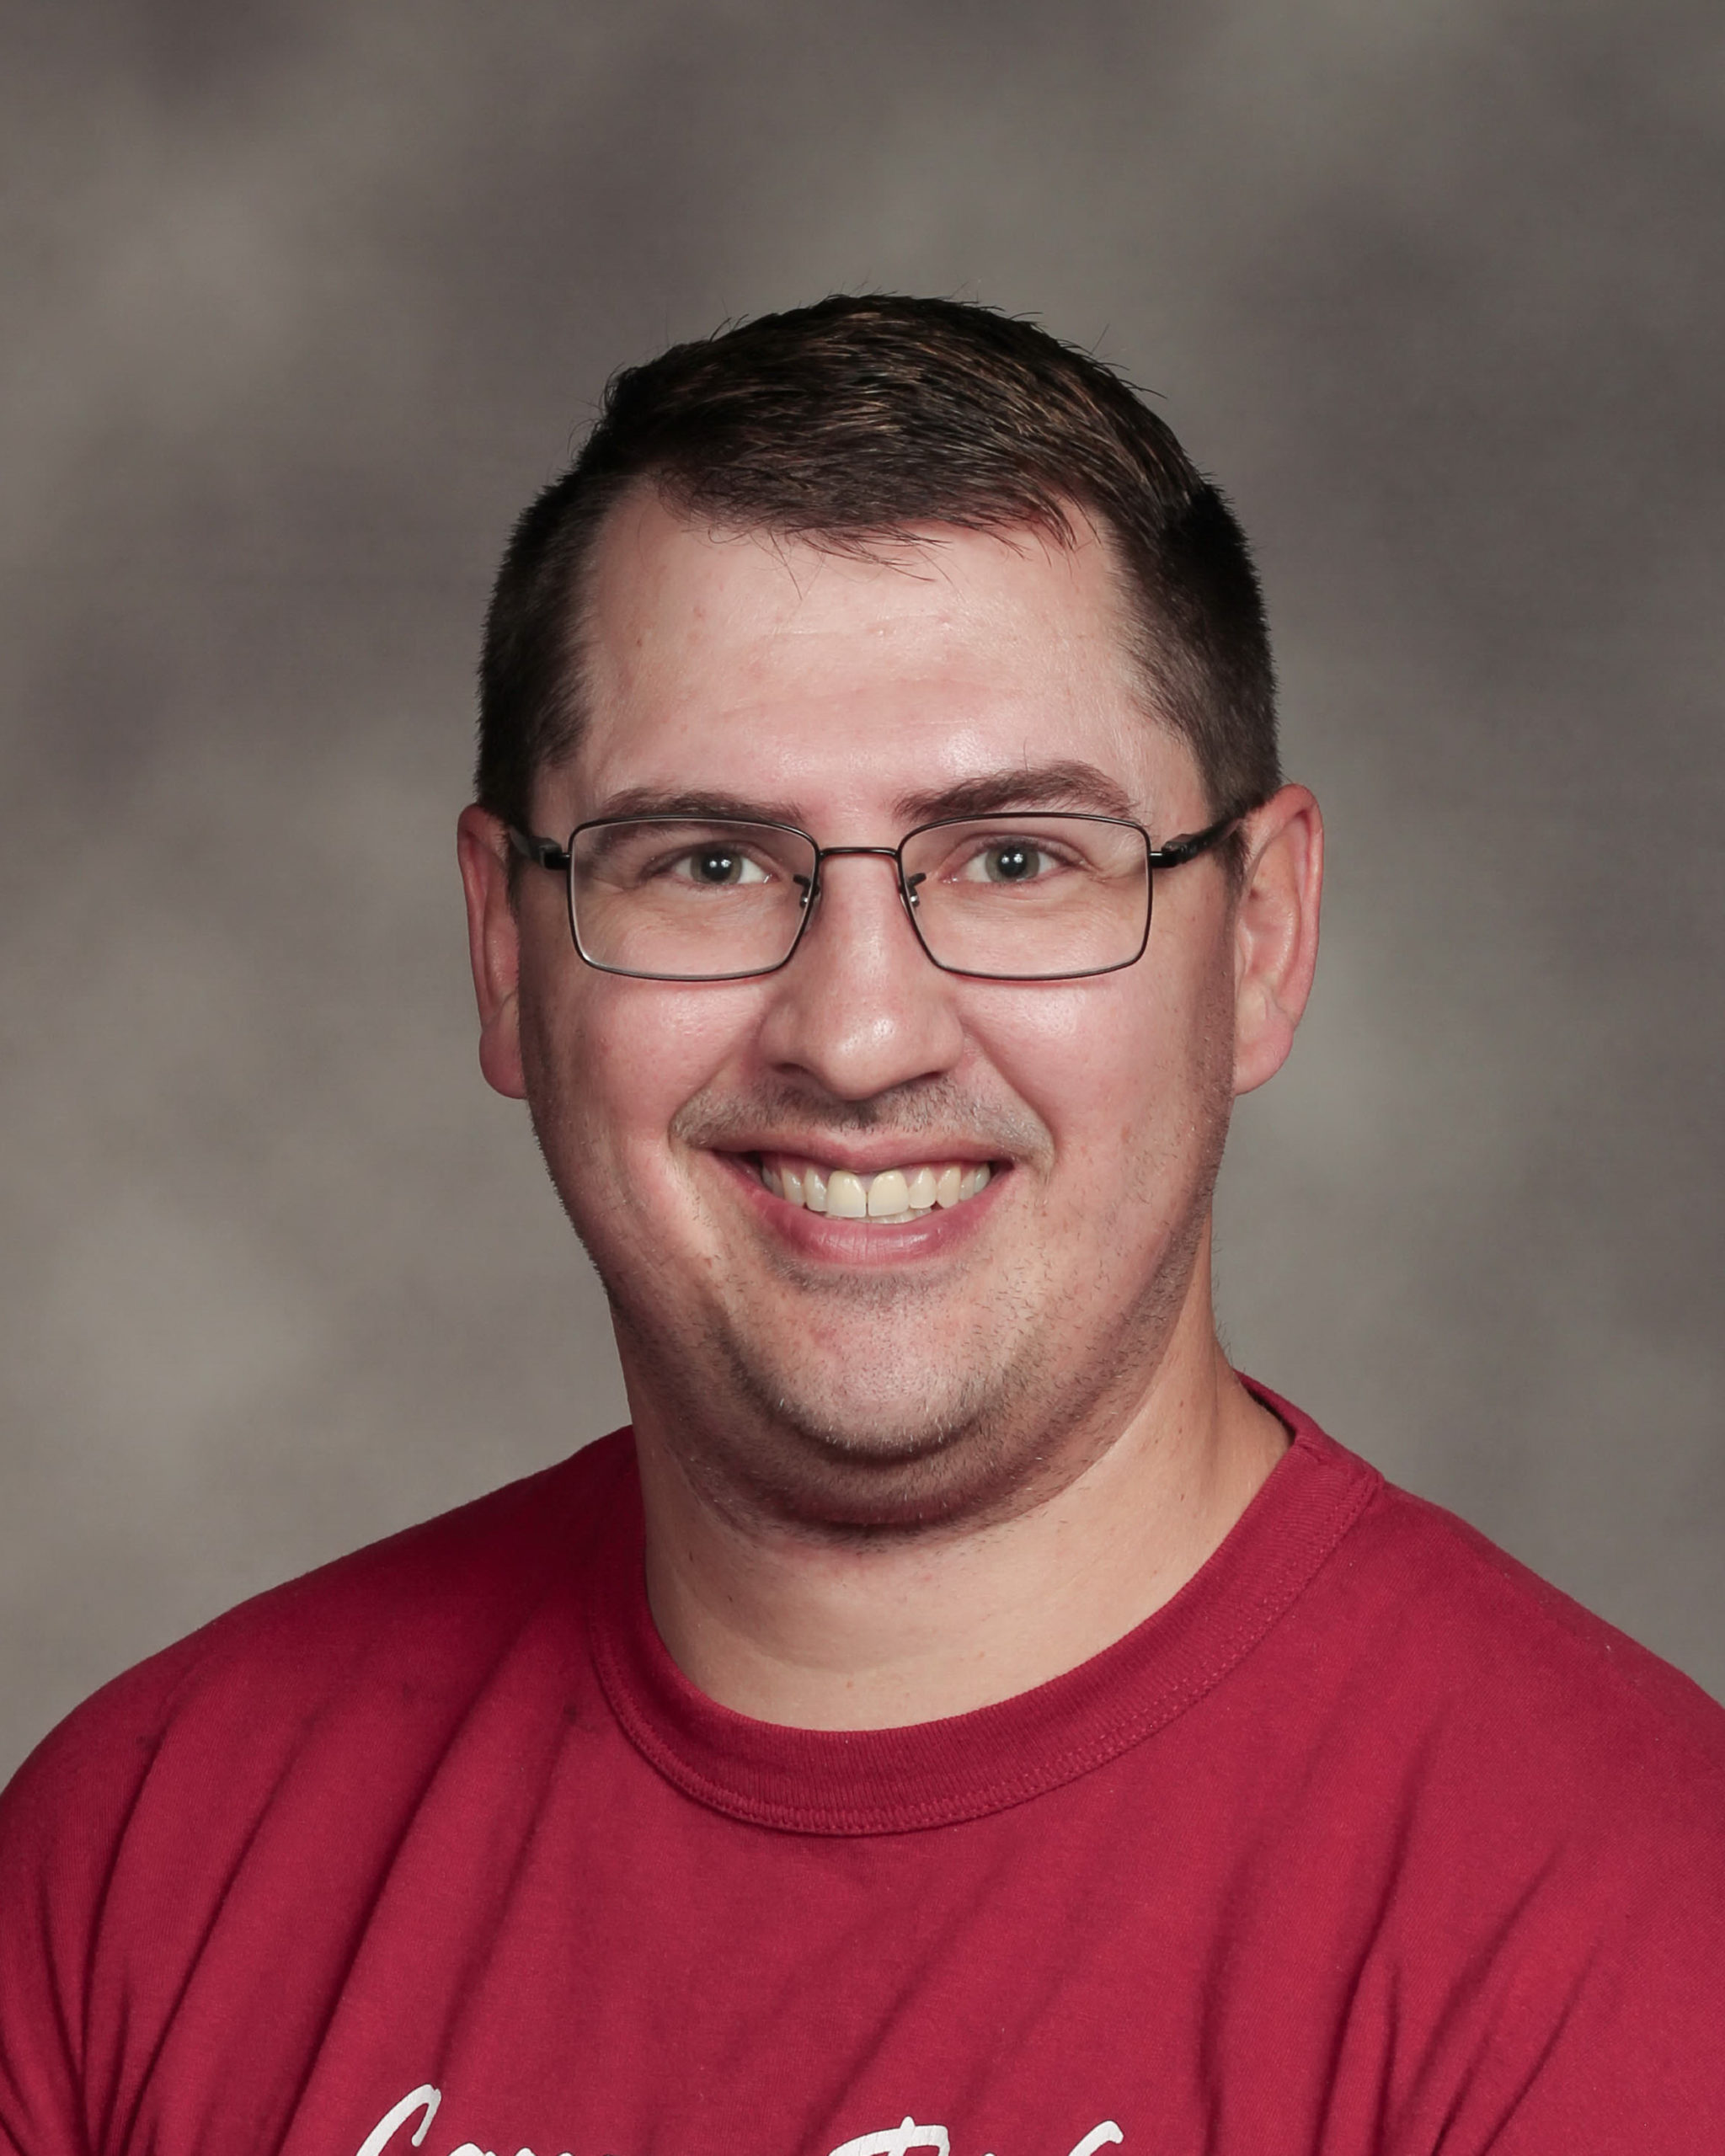 Scott Zuercher